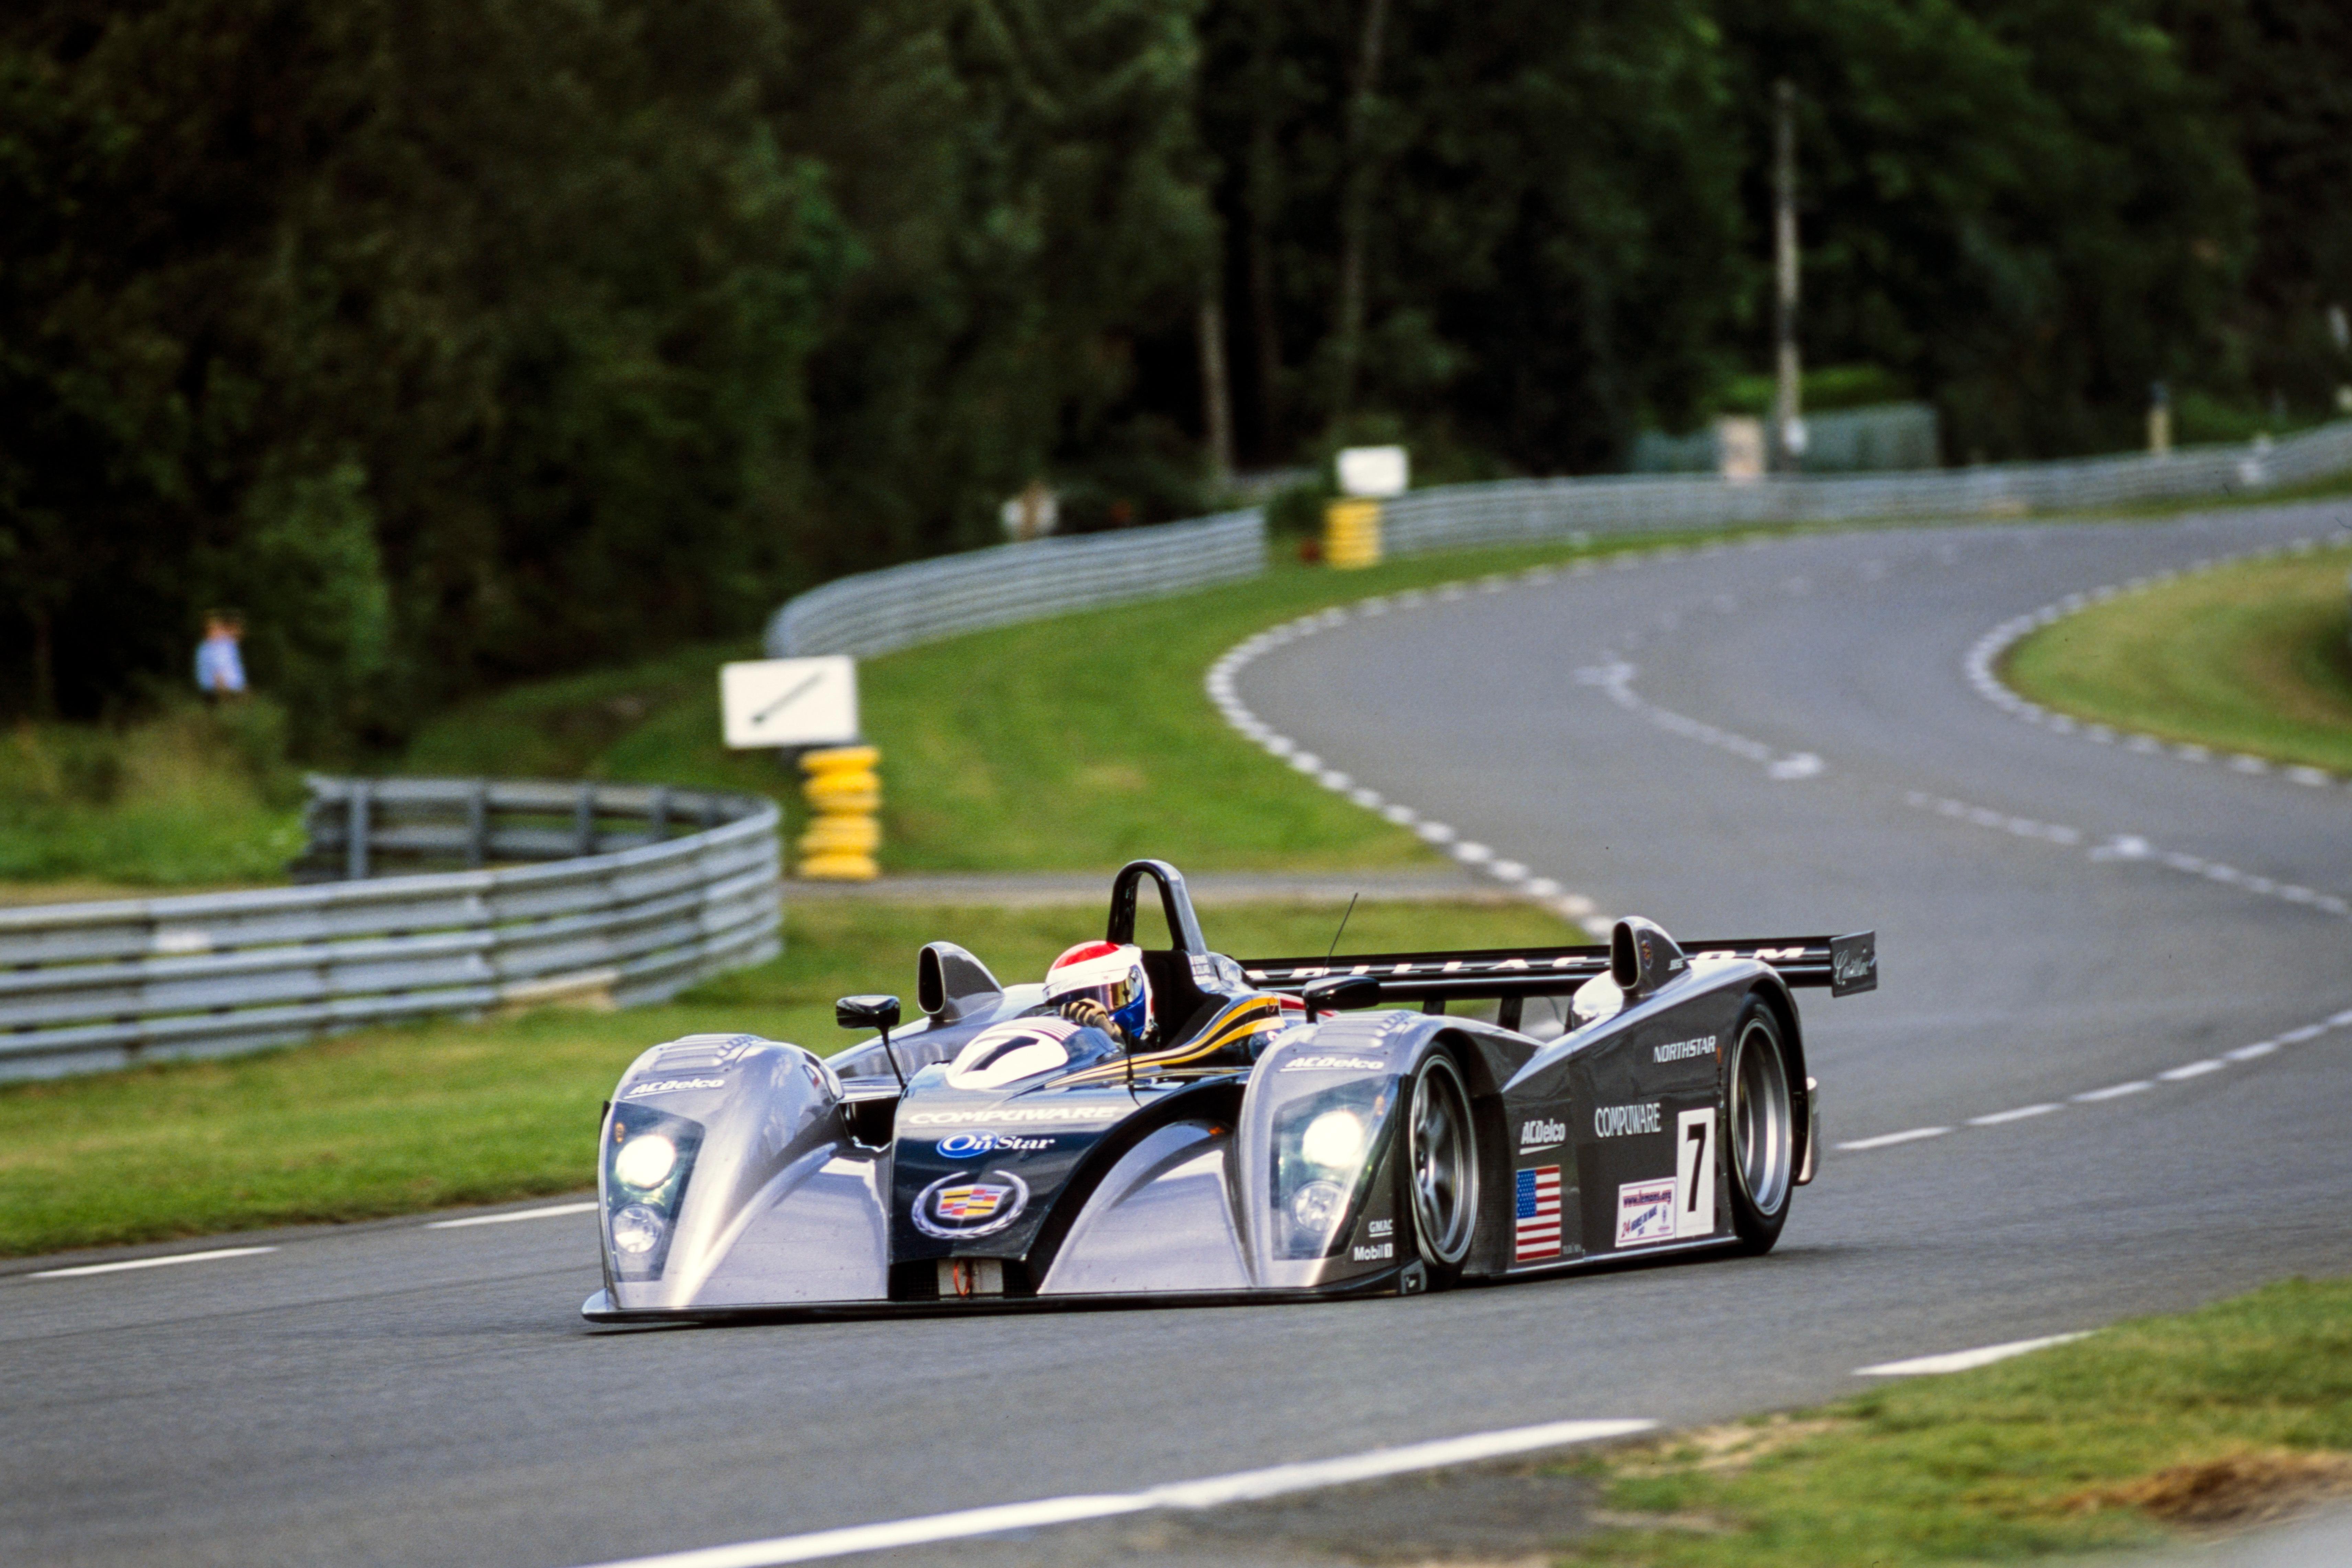 Emmanuel Collard / Eric Bernard / JJ Lehto, Team Cadillac, Cadillac Northstar LMP-02, 2002